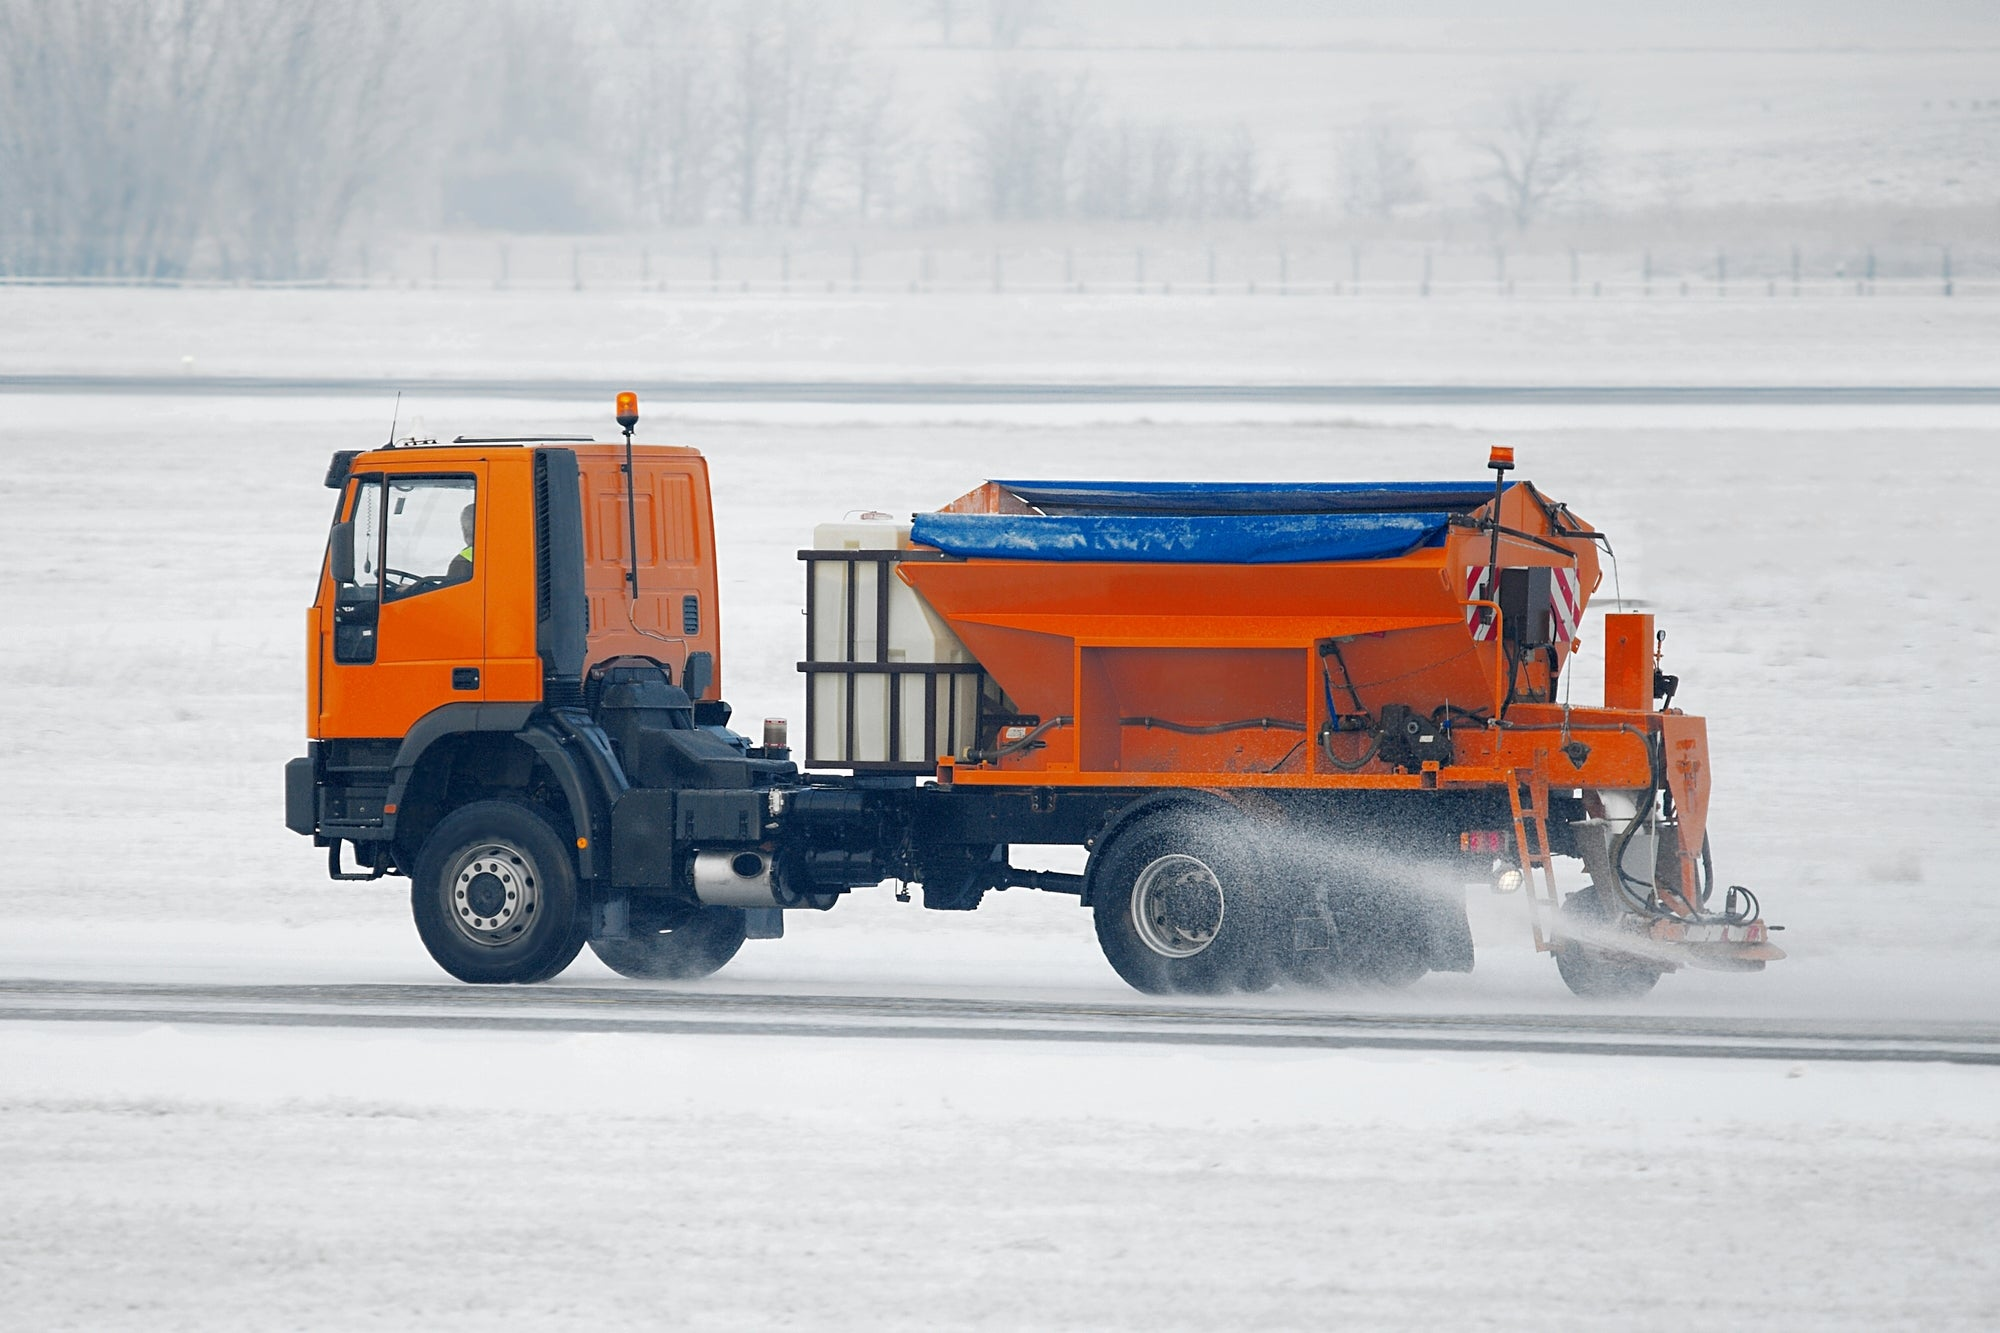 An orange truck spreading salt on a snowy airport runway